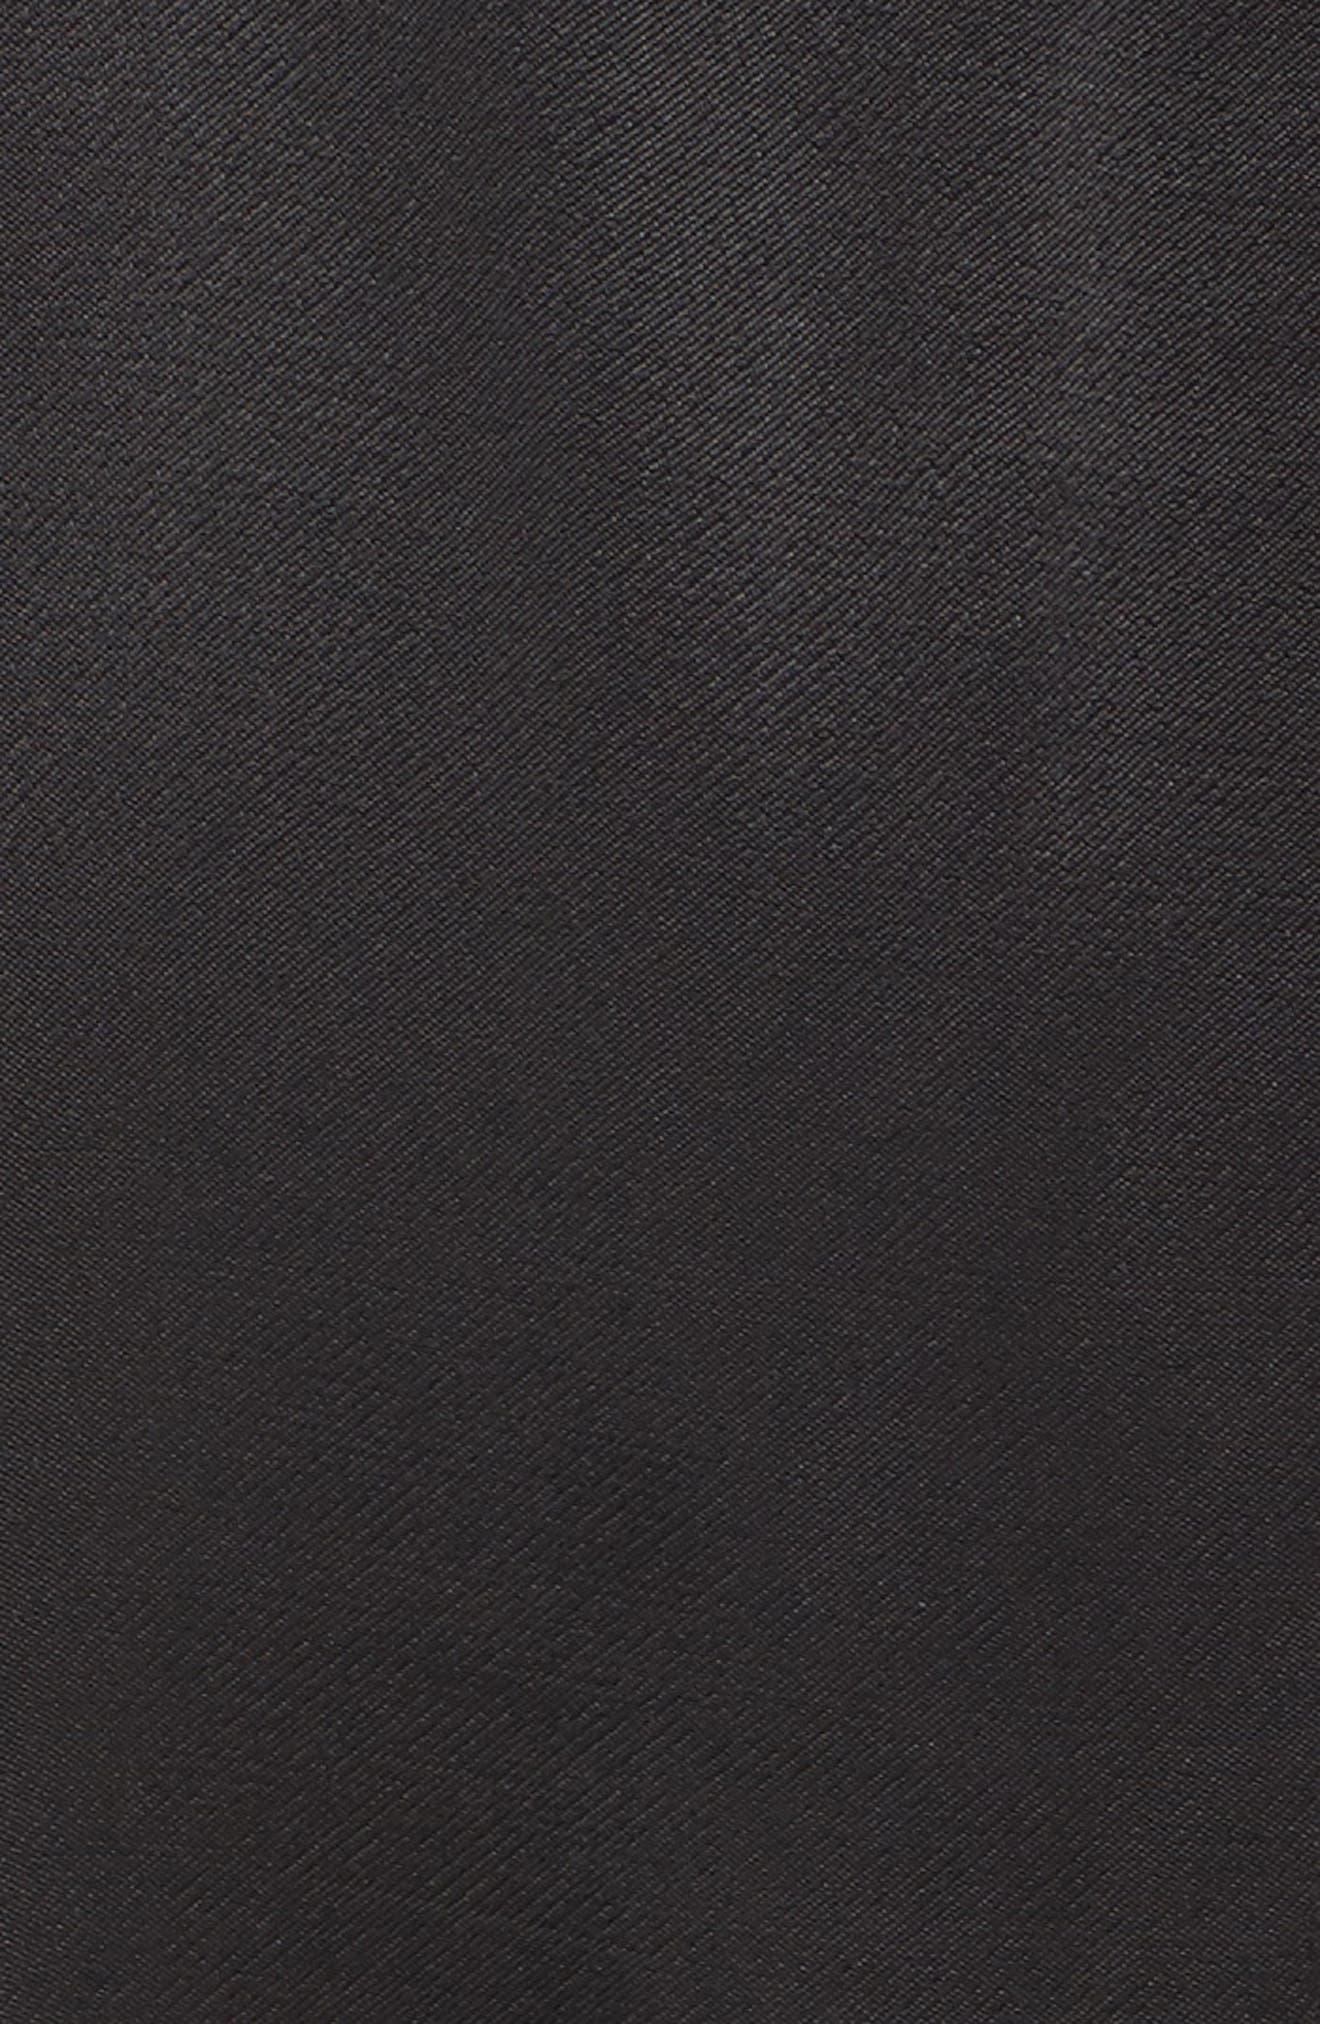 Cassia Ruffle Trim Shirtdress,                             Alternate thumbnail 6, color,                             001